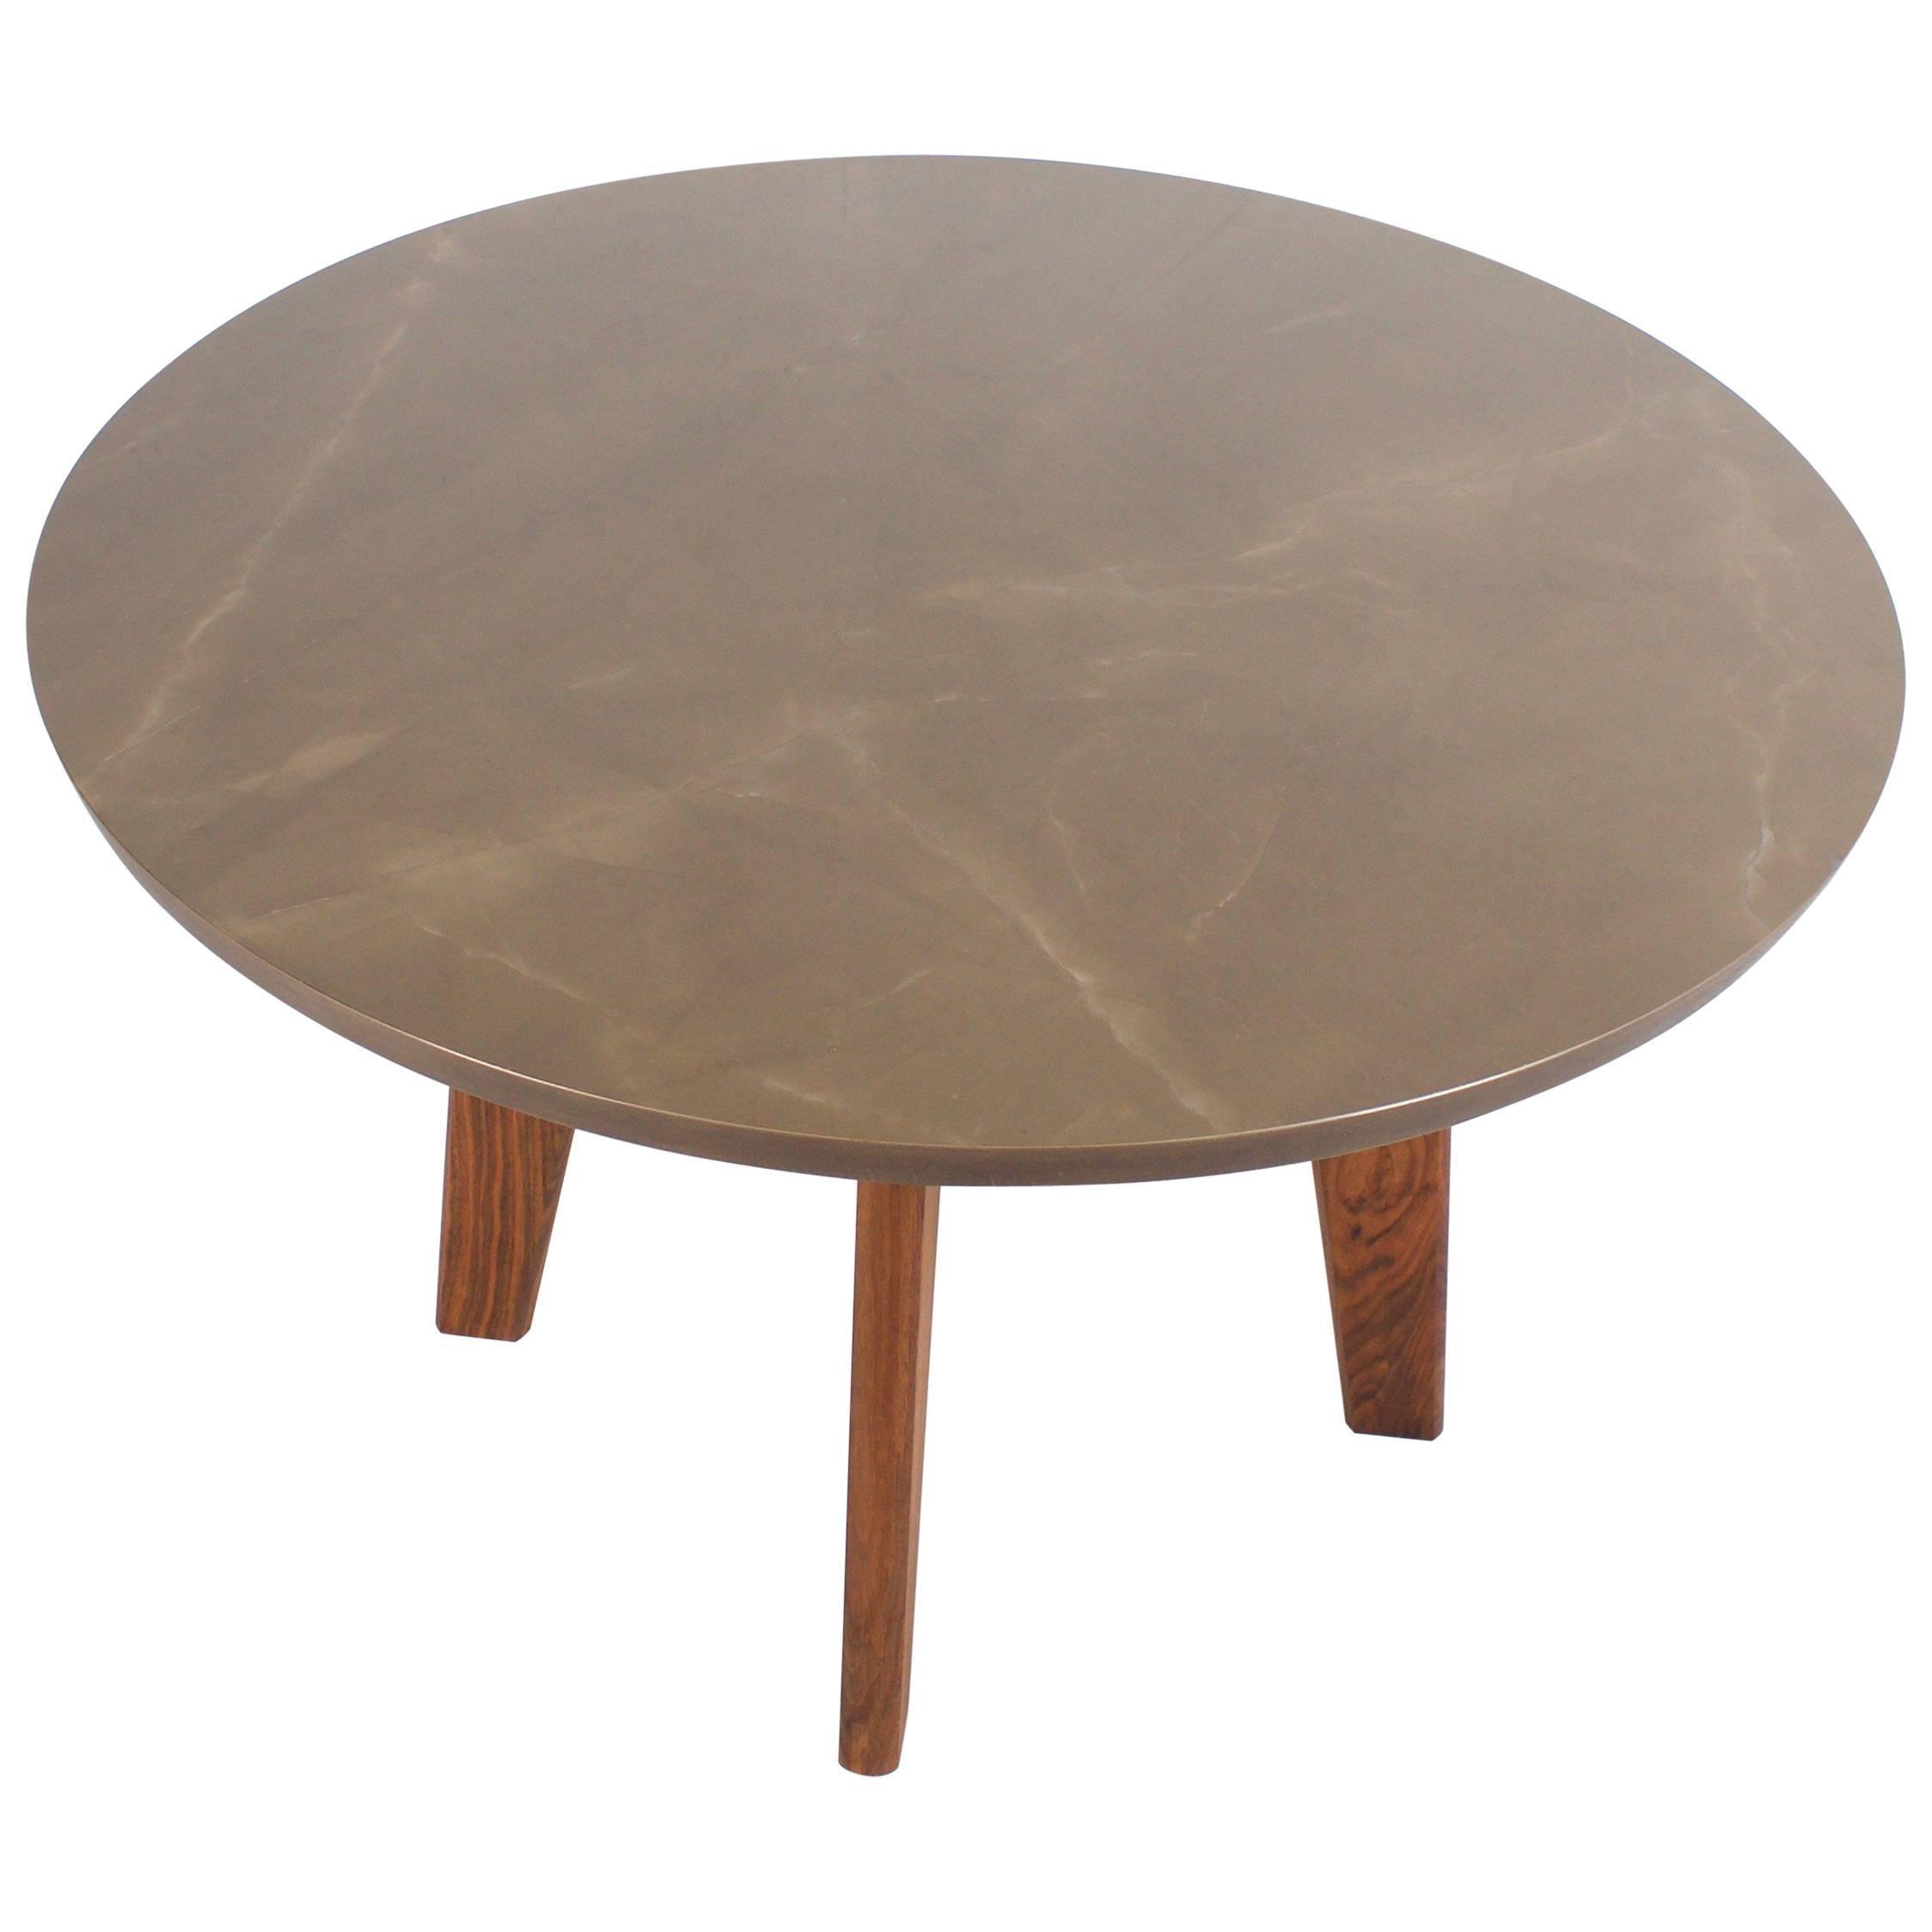 Contemporary Ceramic Round Dining Table